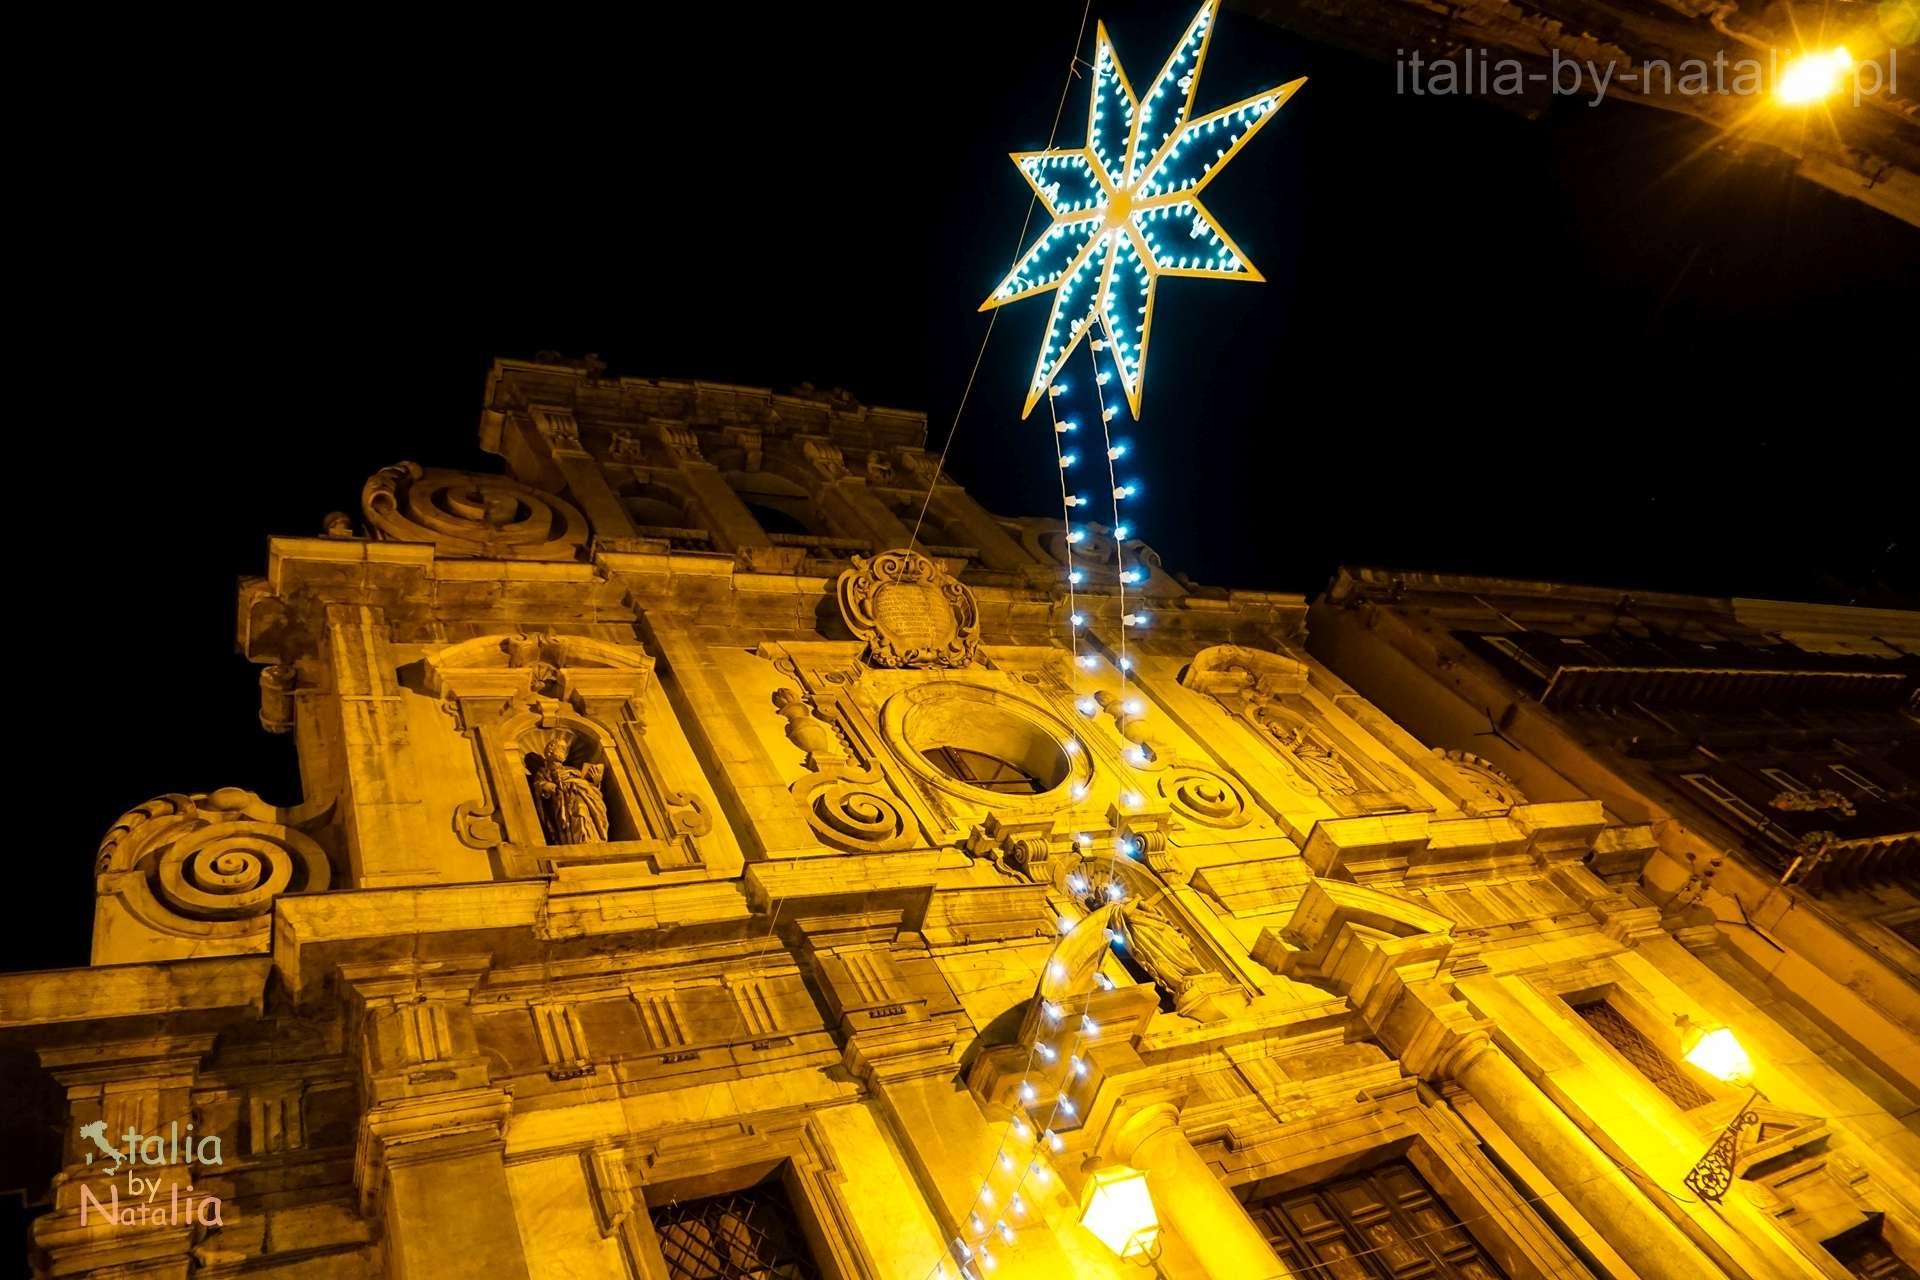 Palermo Sycylia grudzien december christmas święta